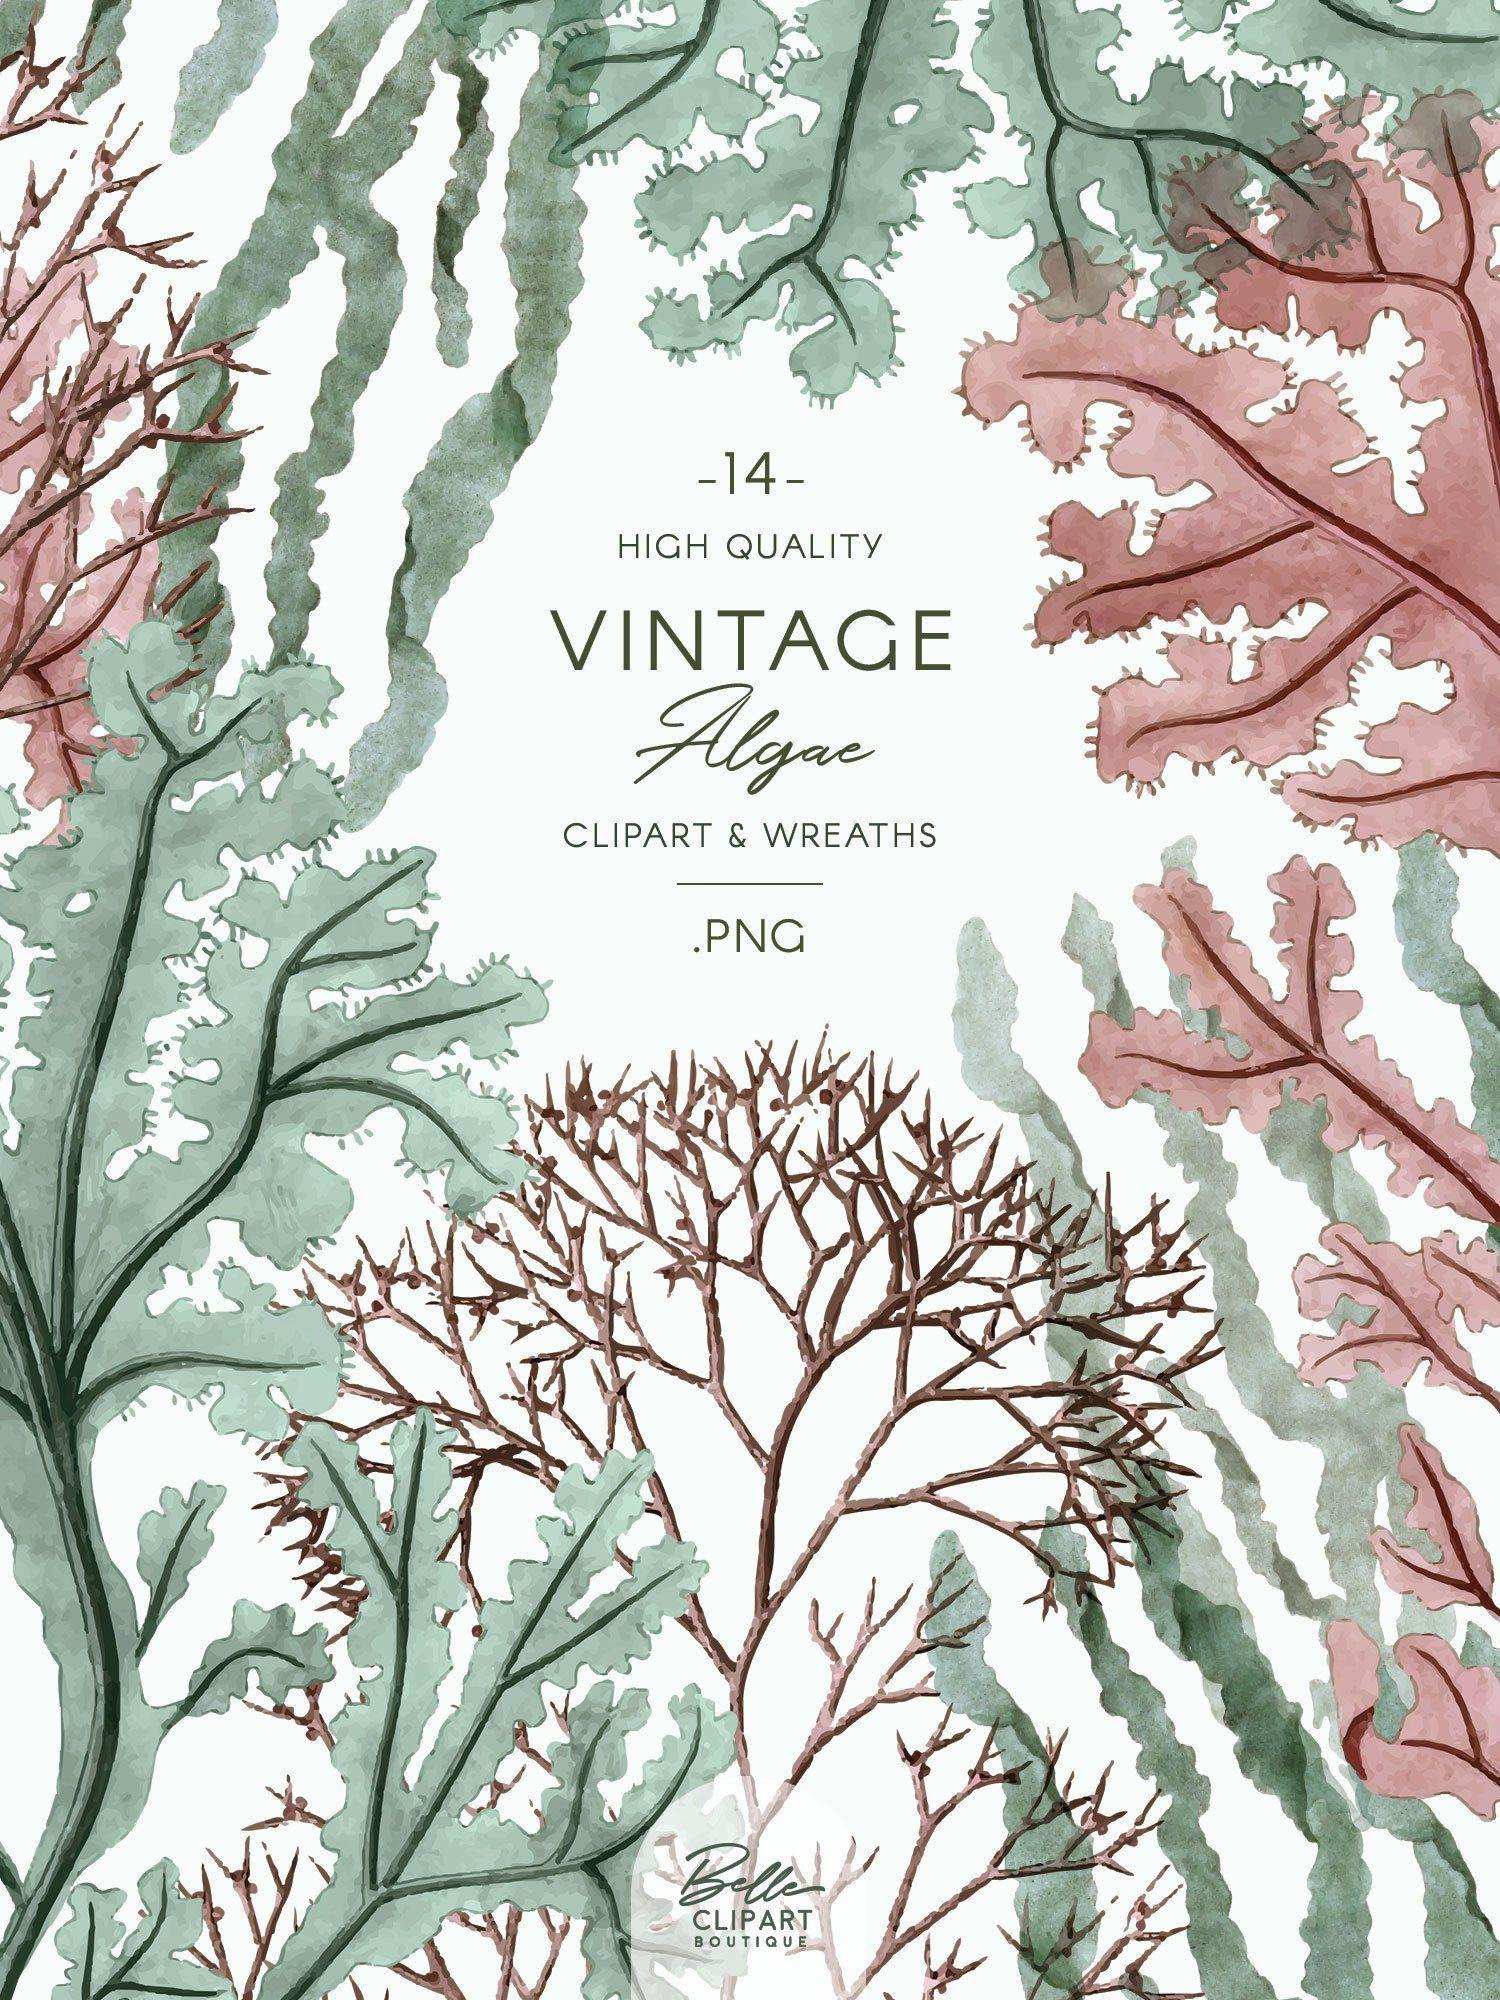 Vintage Algae clip art, watercolor Seaweed illustrations.